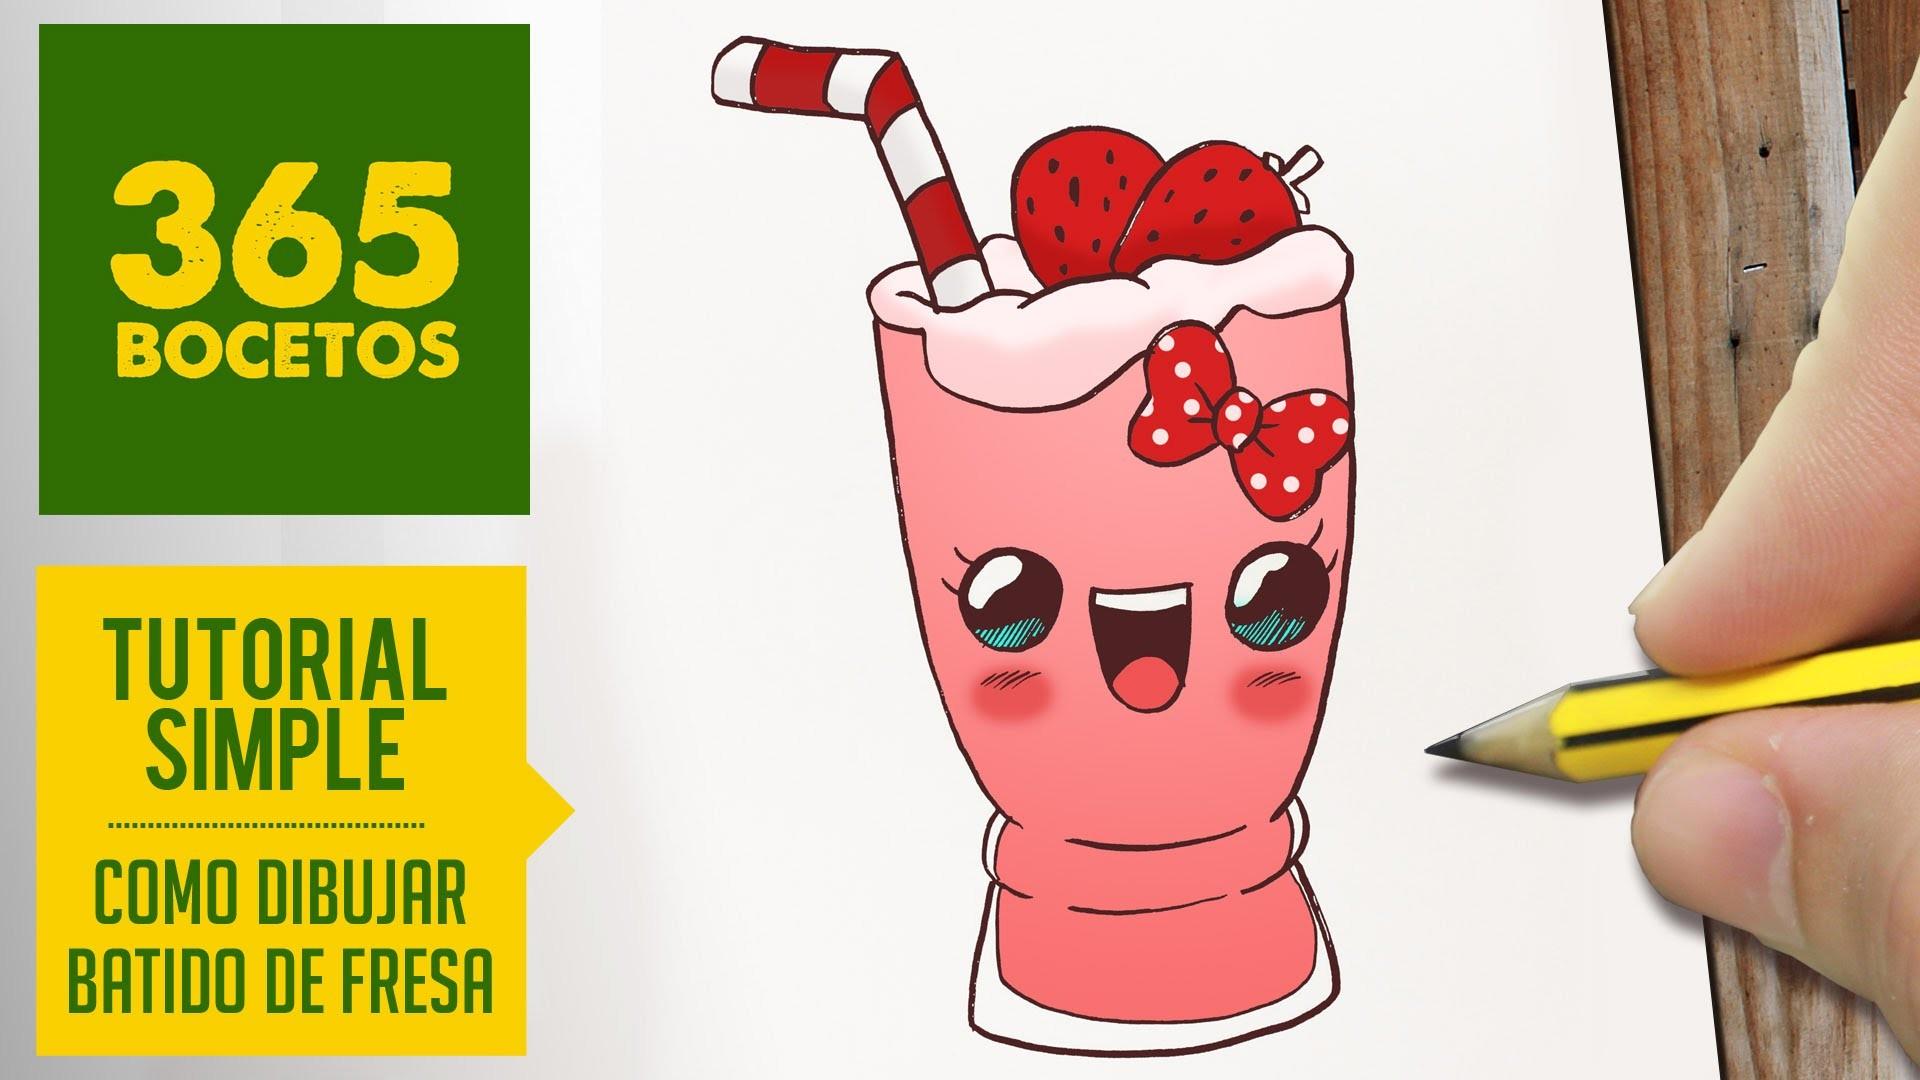 COMO DIBUJAR UN BATIDO DE FRESA KAWAII PASO A PASO - Dibujos kawaii faciles - Strawberry milkshake